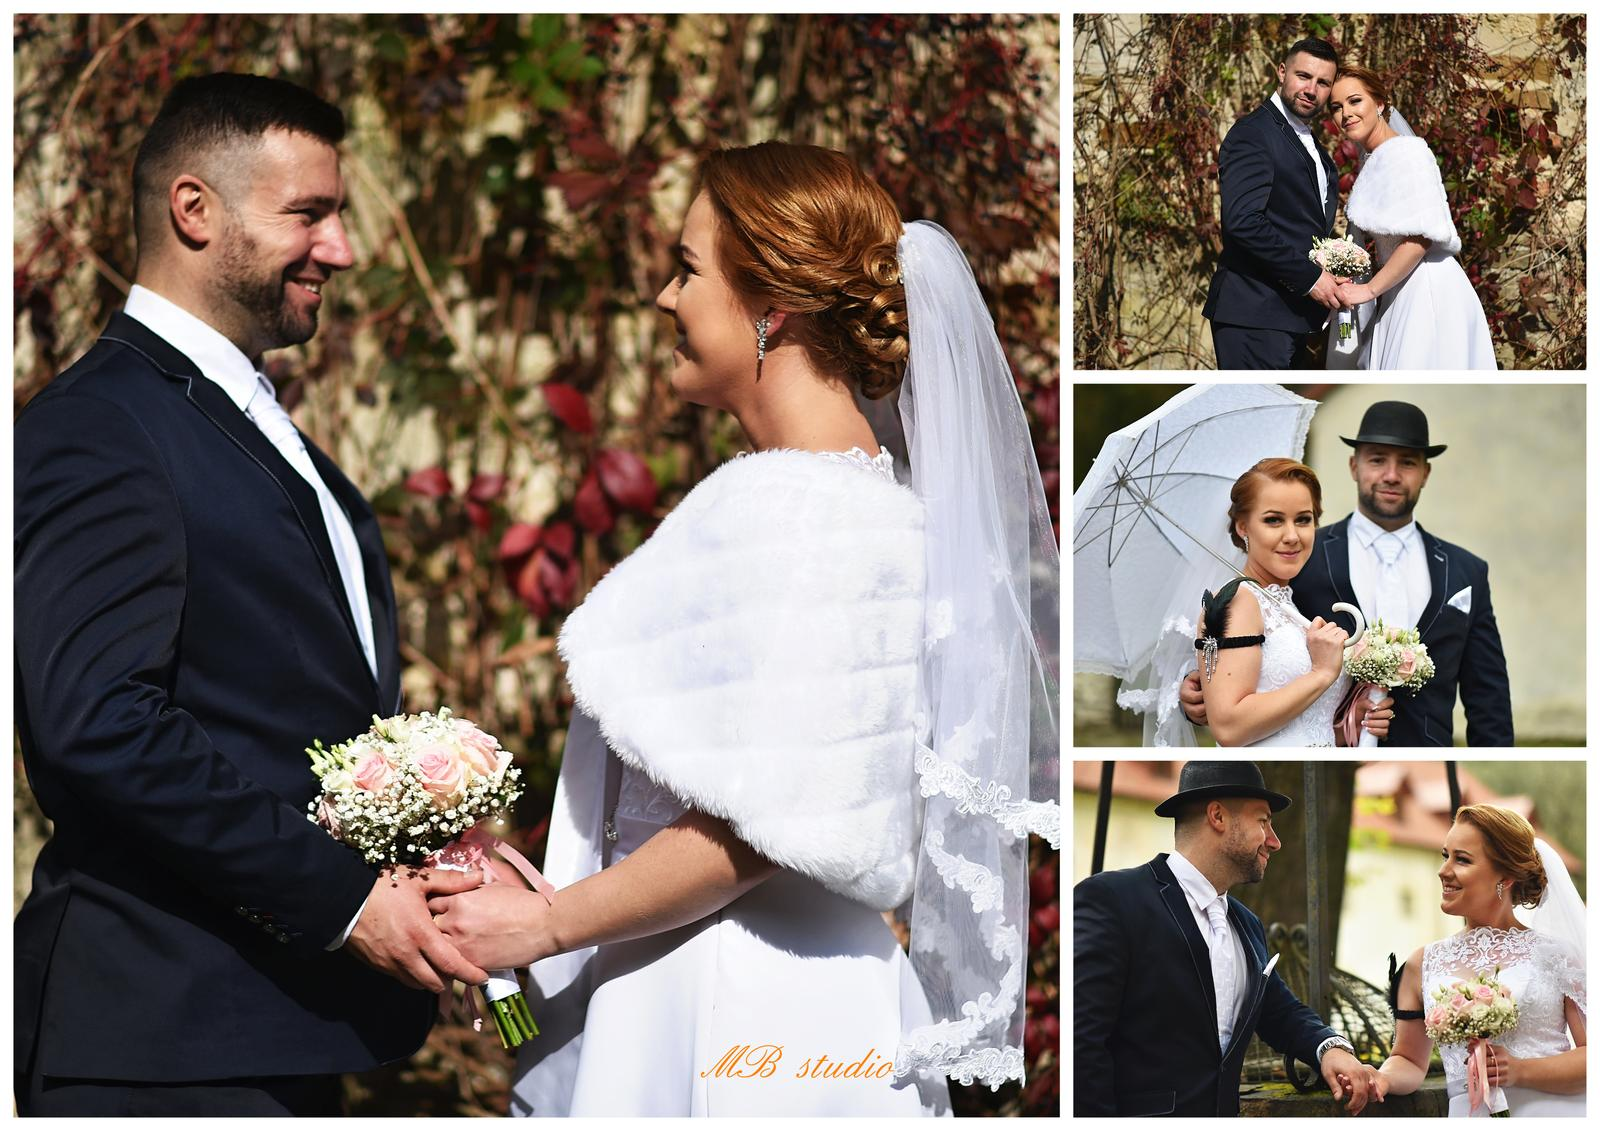 8a09bd4629 Fotograf na svadbu 18.5.2019 v Leopoldove - - Fot...